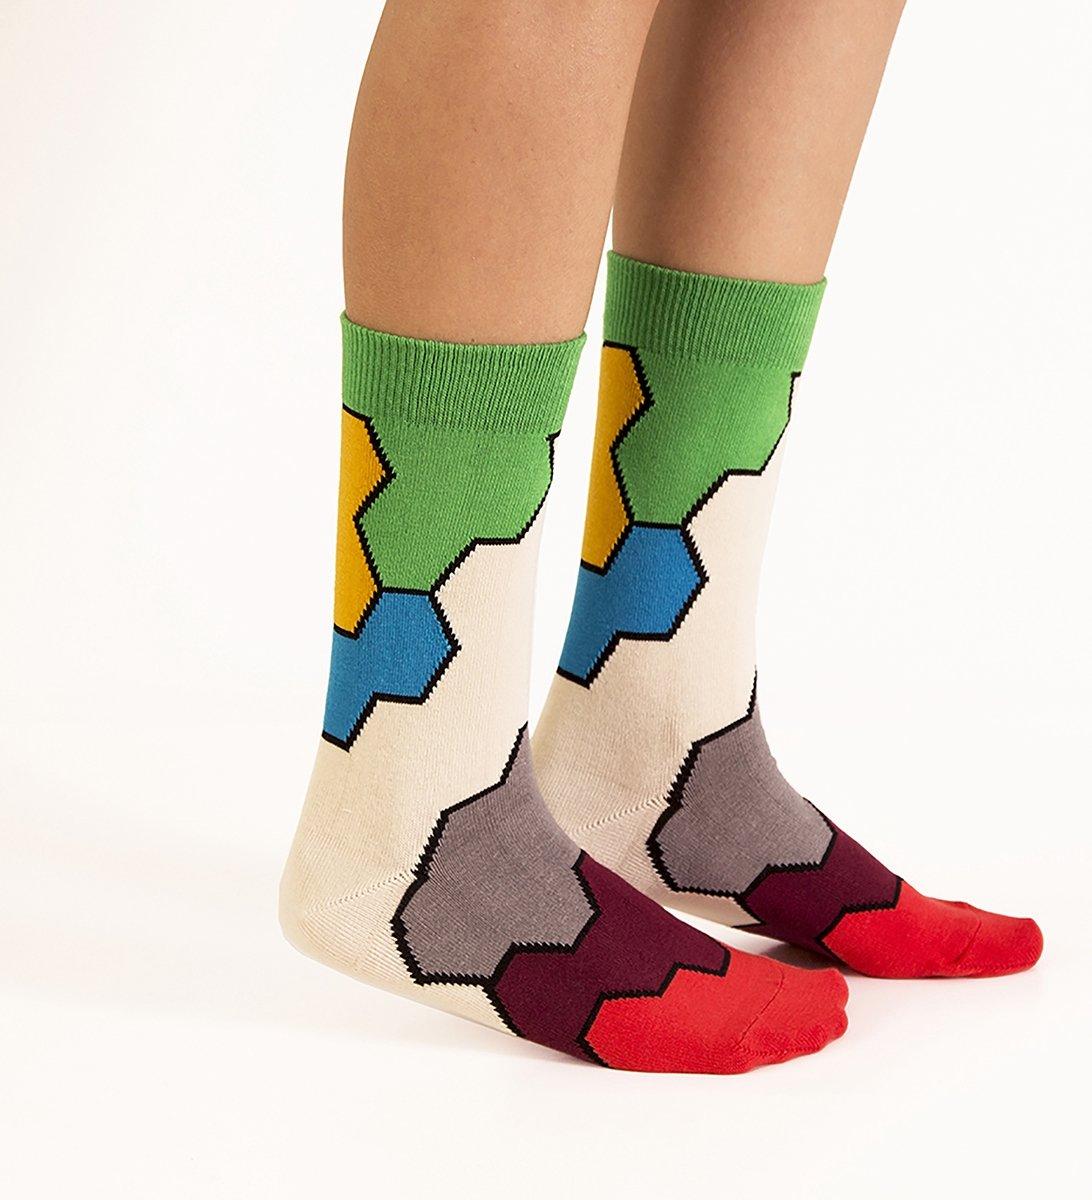 Ballonet Socks - Molecule / 36-40